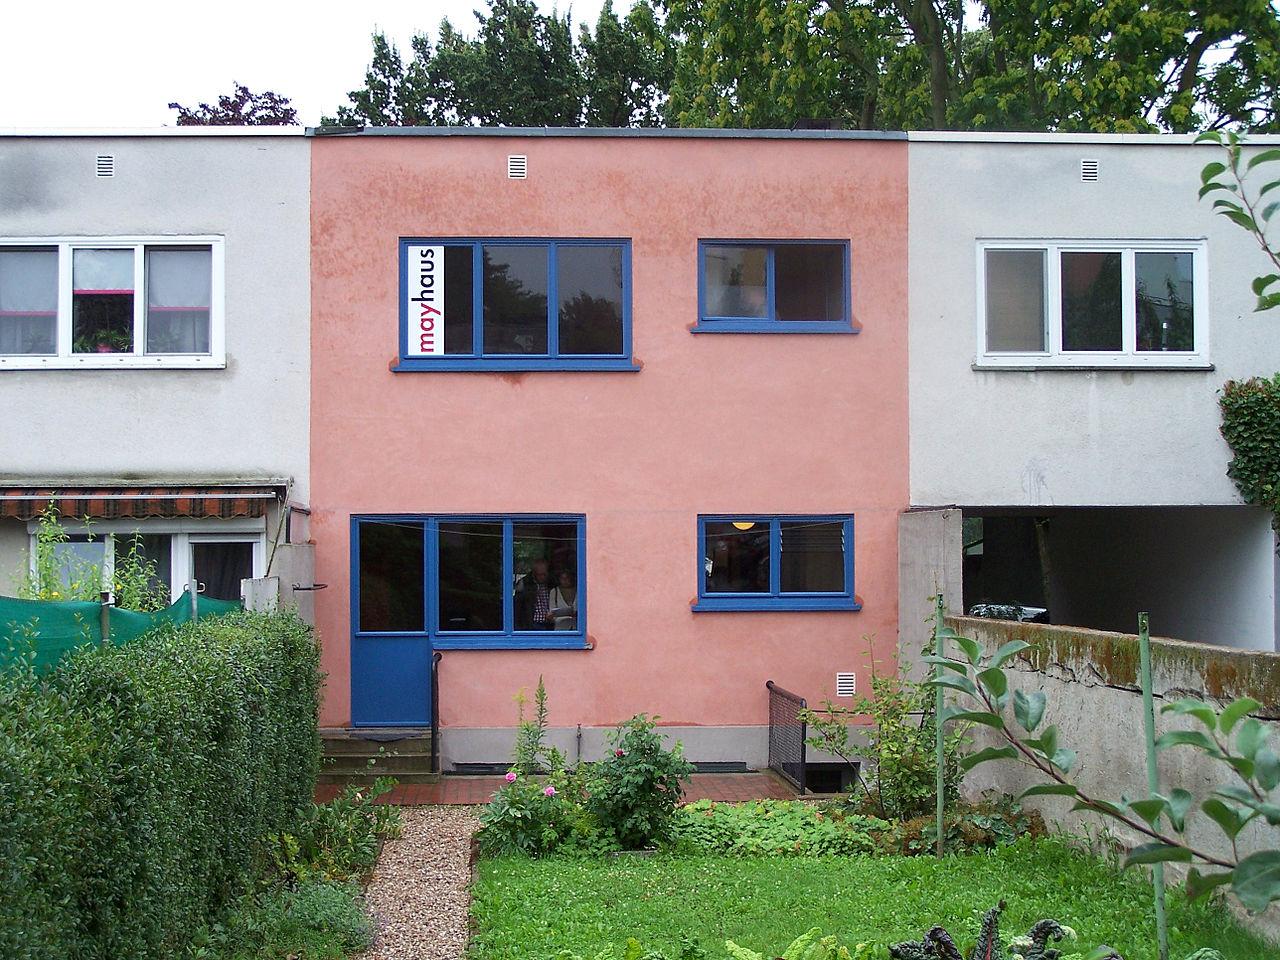 architektur der klassischen moderne in frankfurt am main. Black Bedroom Furniture Sets. Home Design Ideas